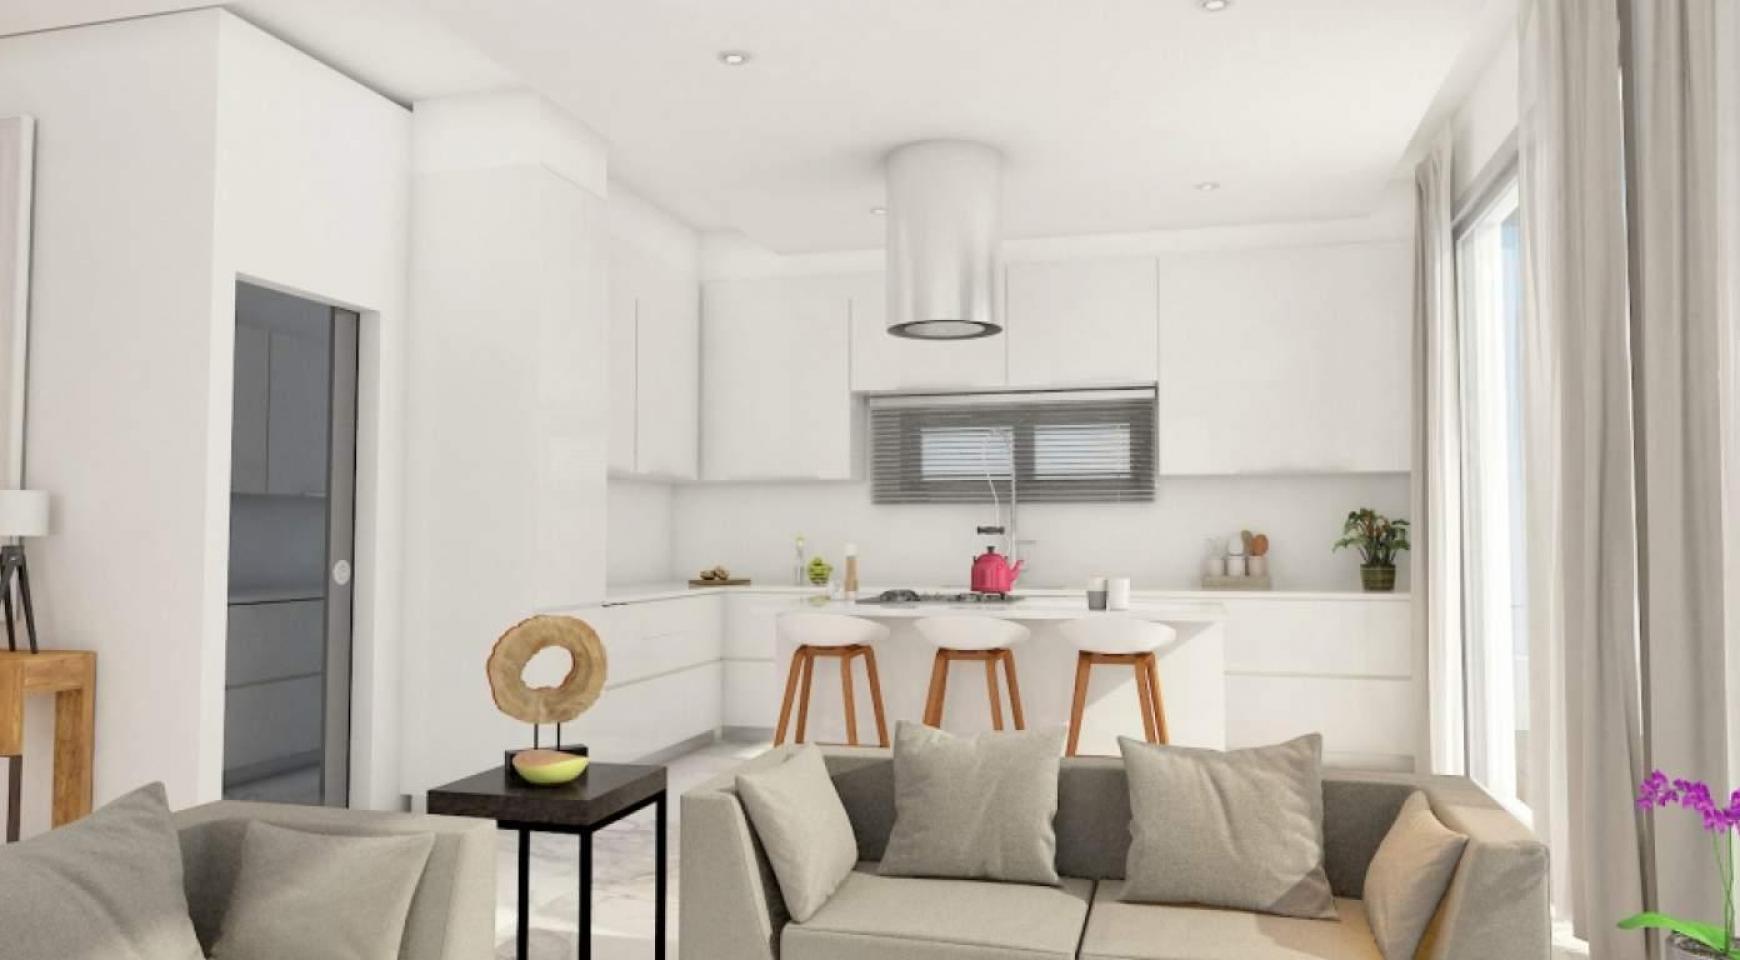 Contemporary Beachfront Villa with 5 Bedrooms - 14